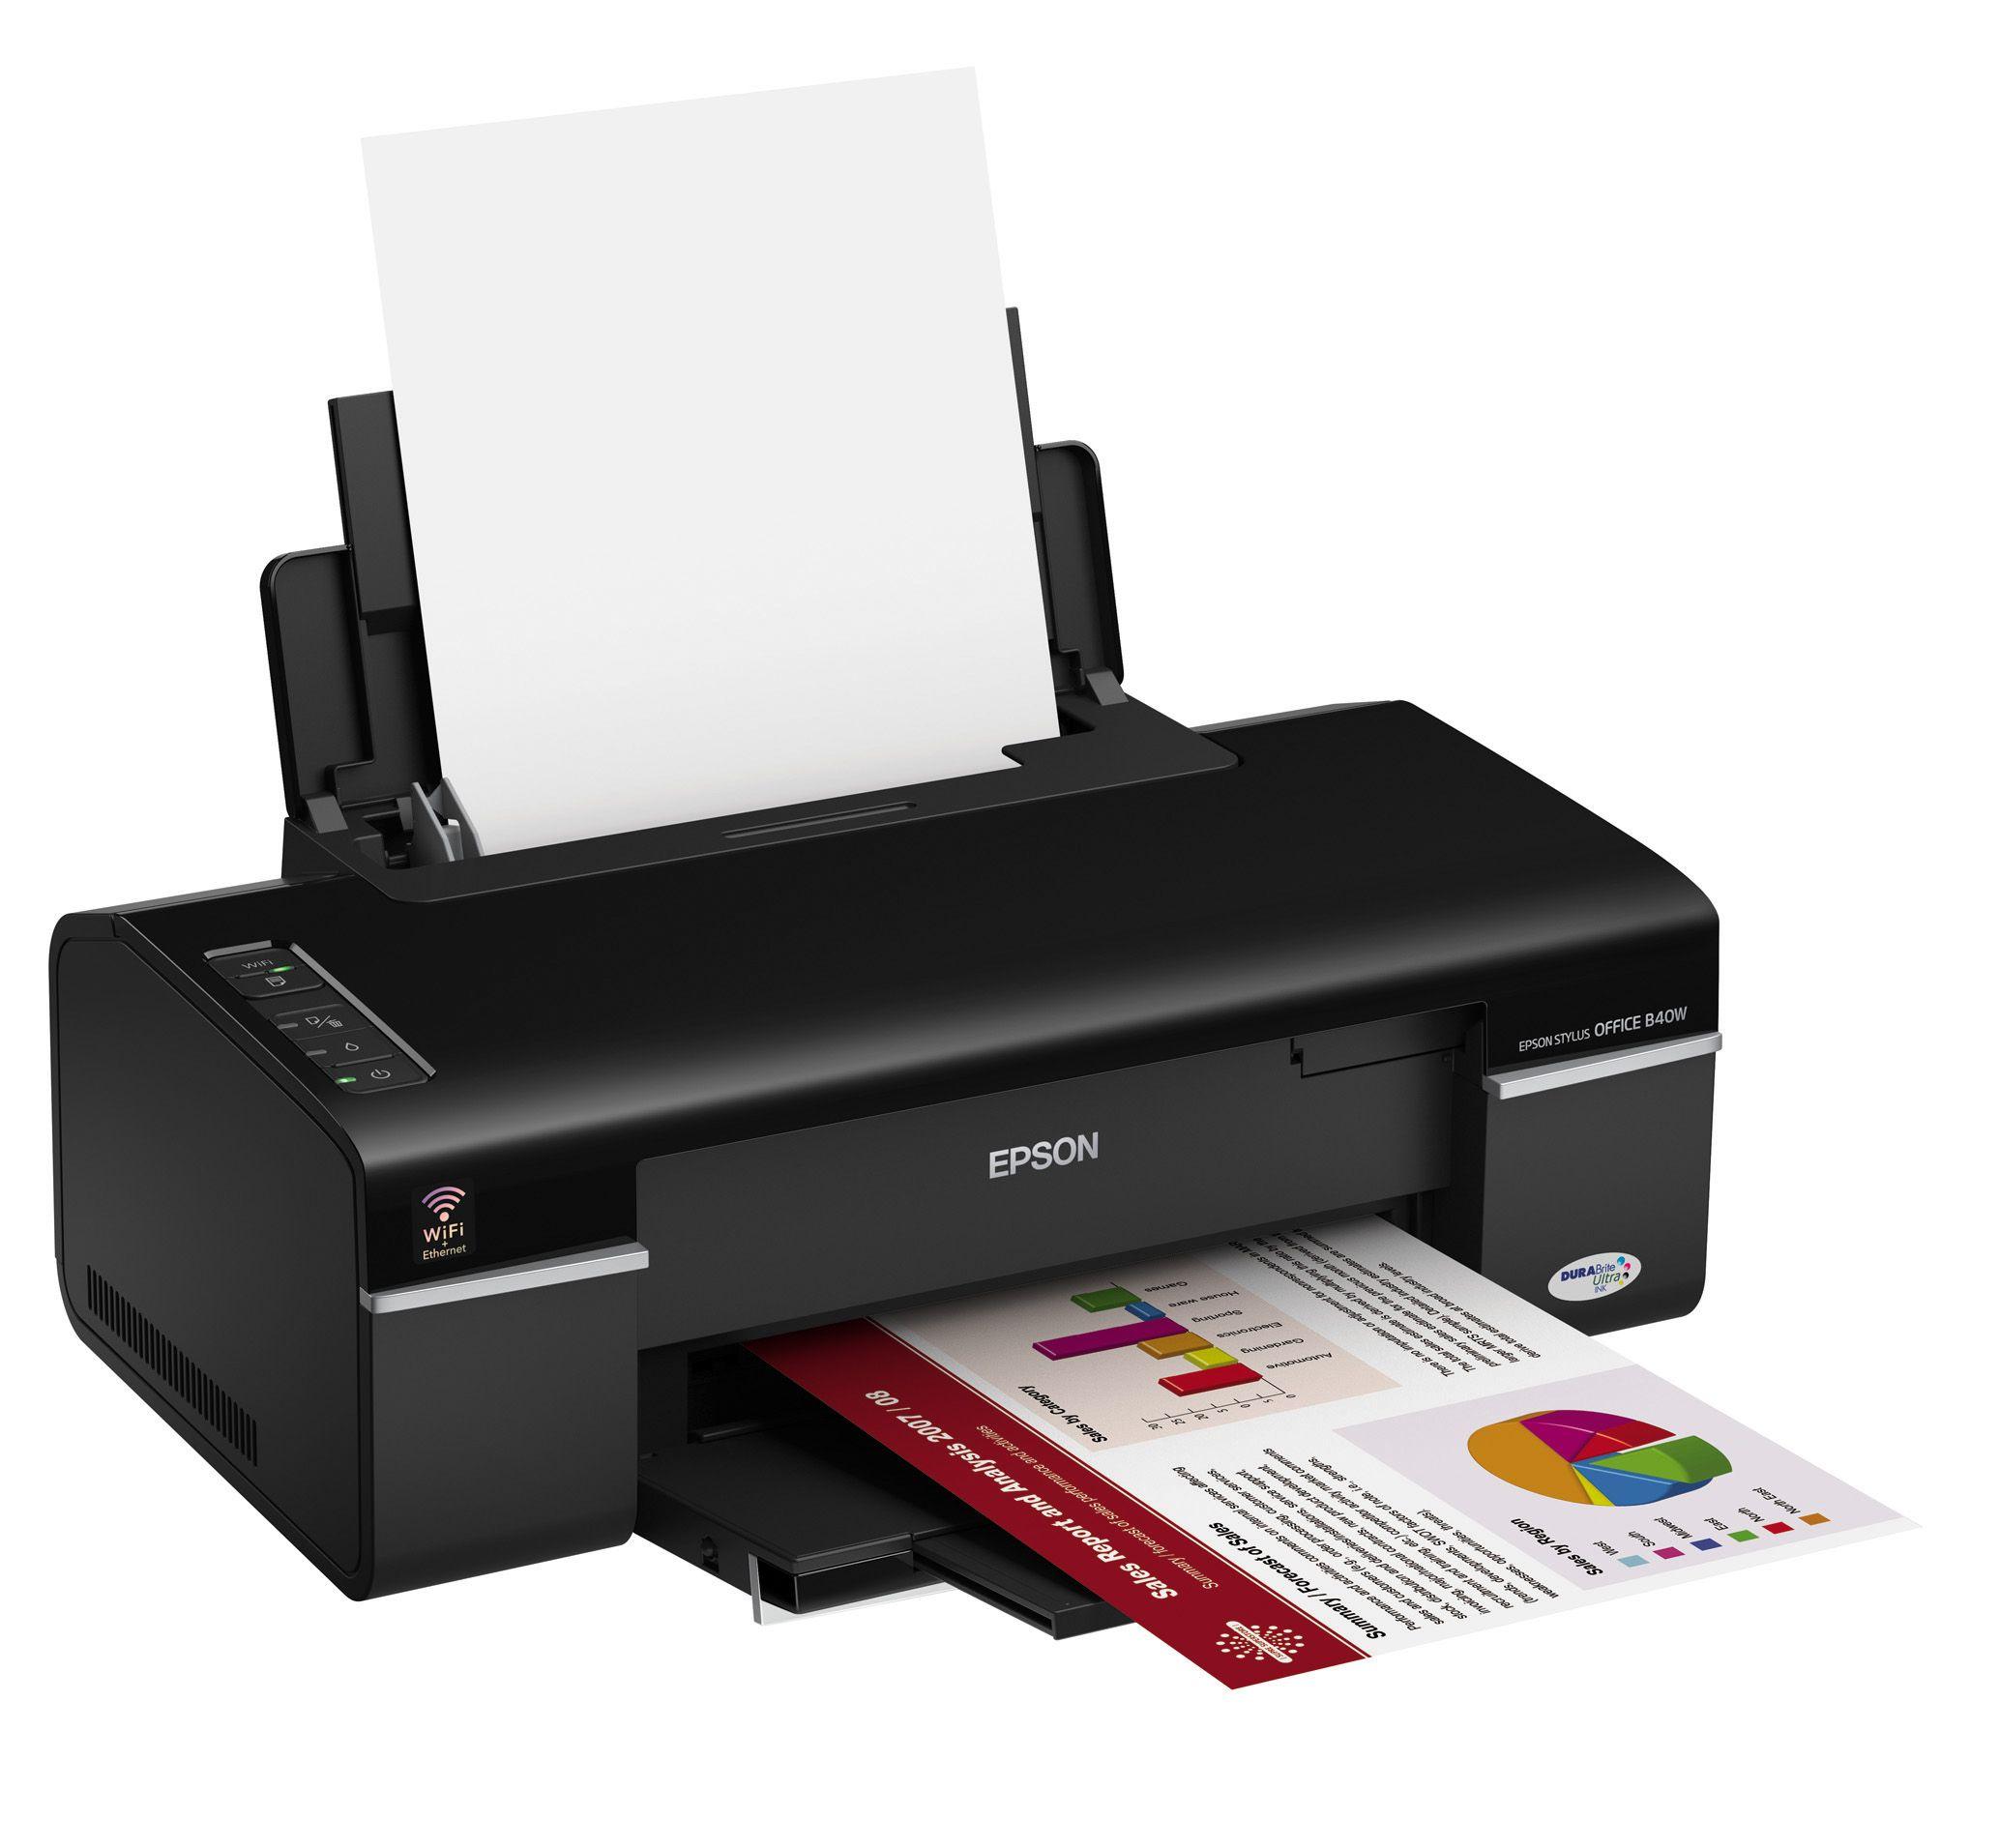 epson printer error reset | Waste Ink Pad Error Counter Reset | Key